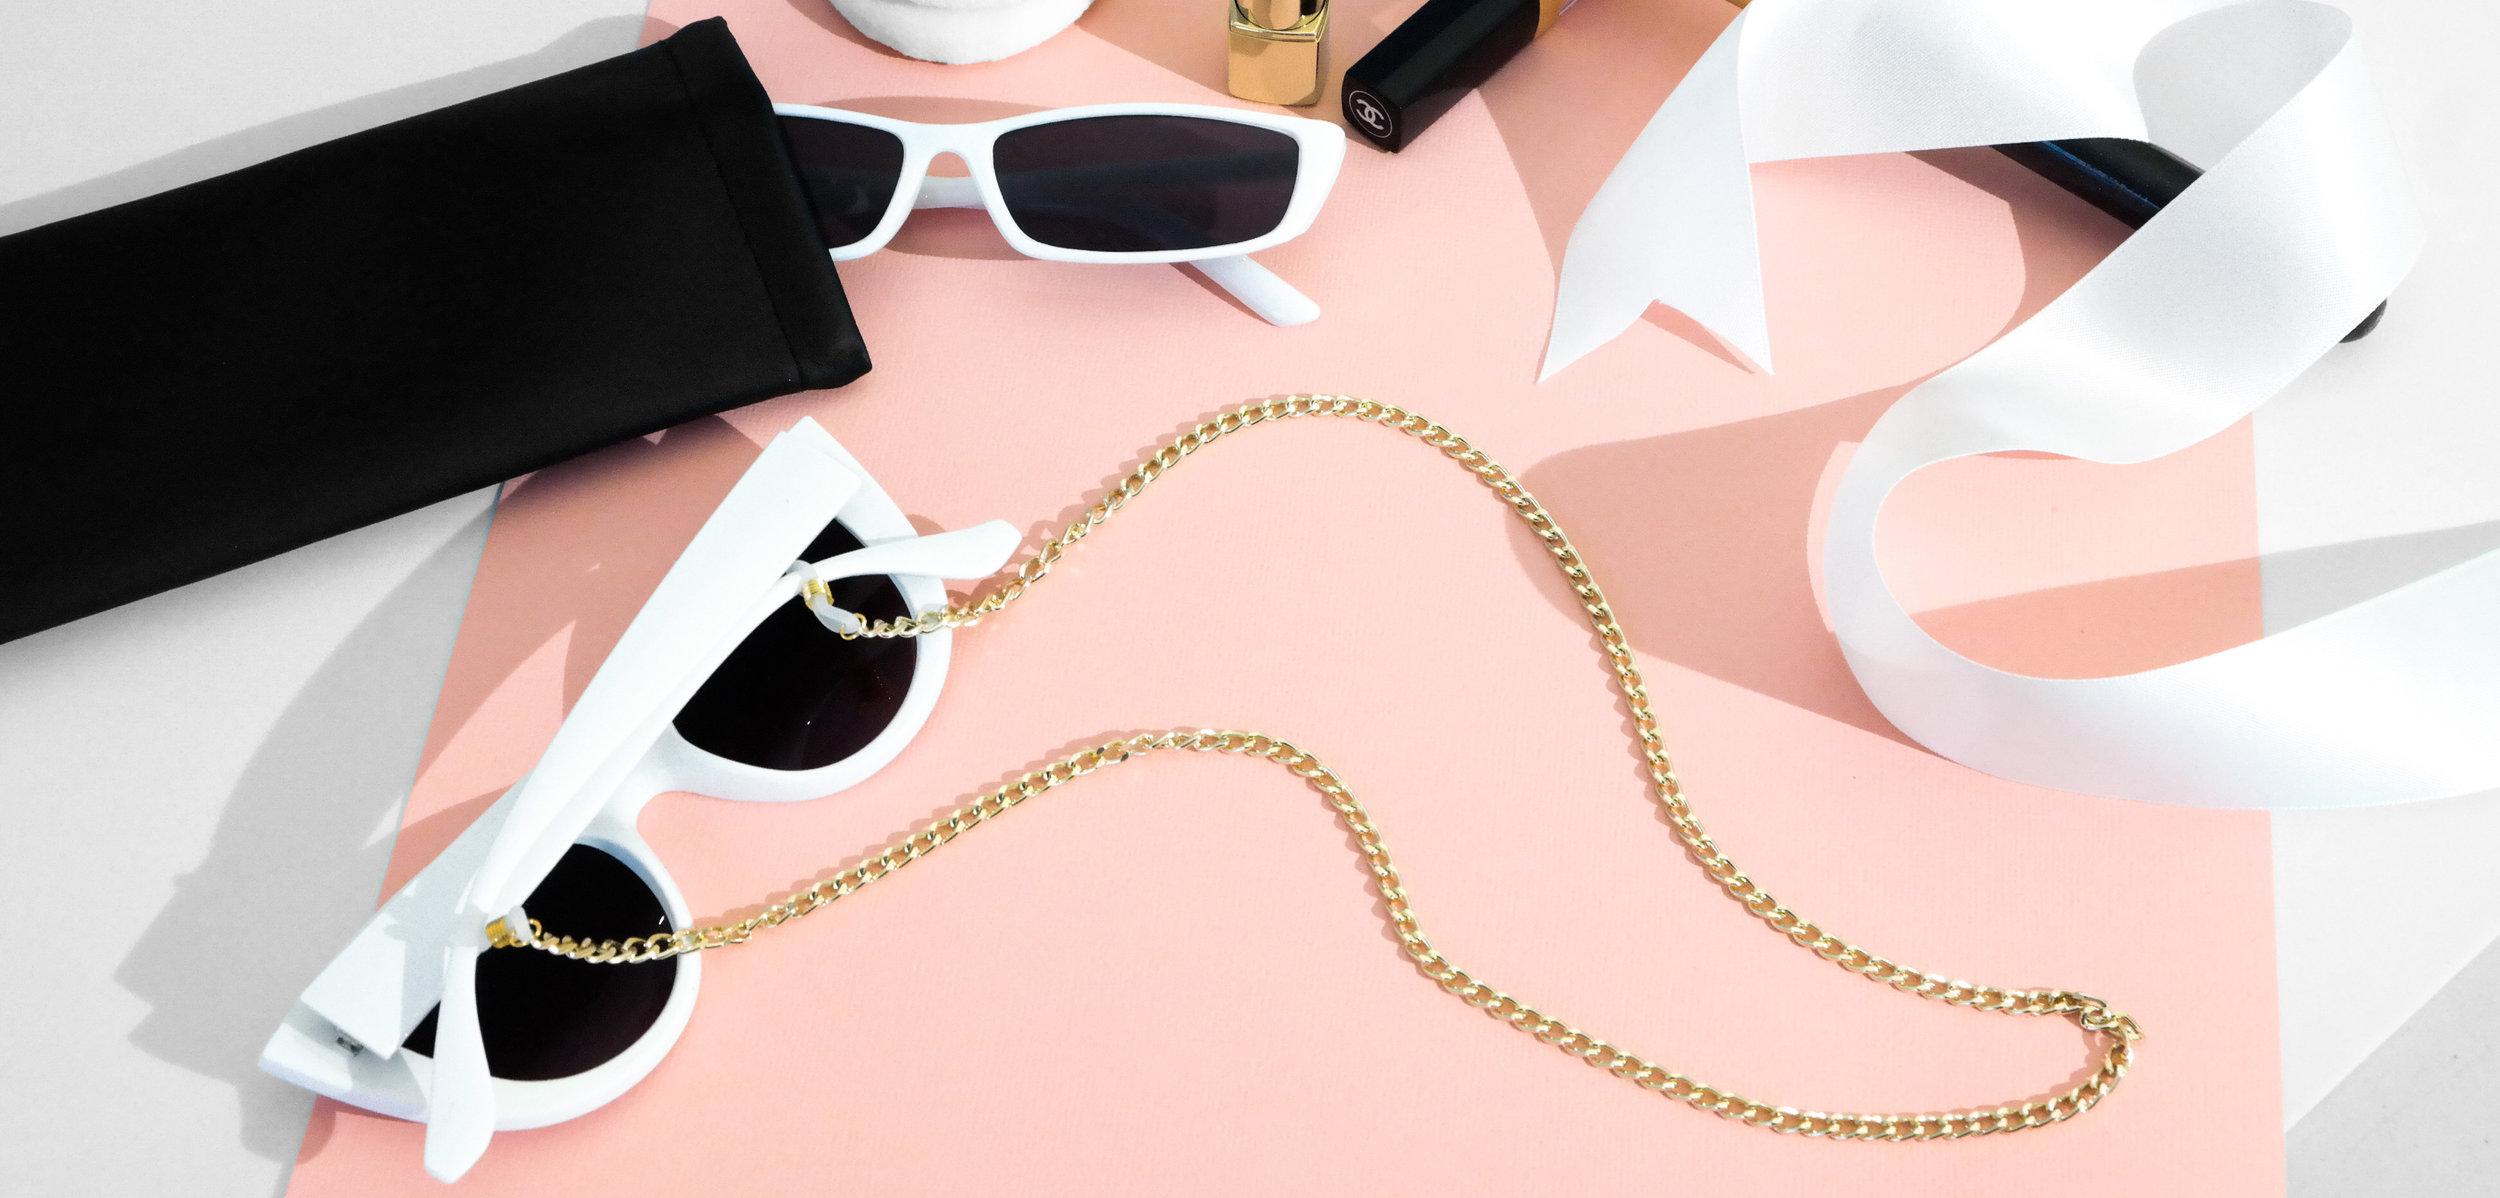 accessories_categorybanner_june2018.JPG